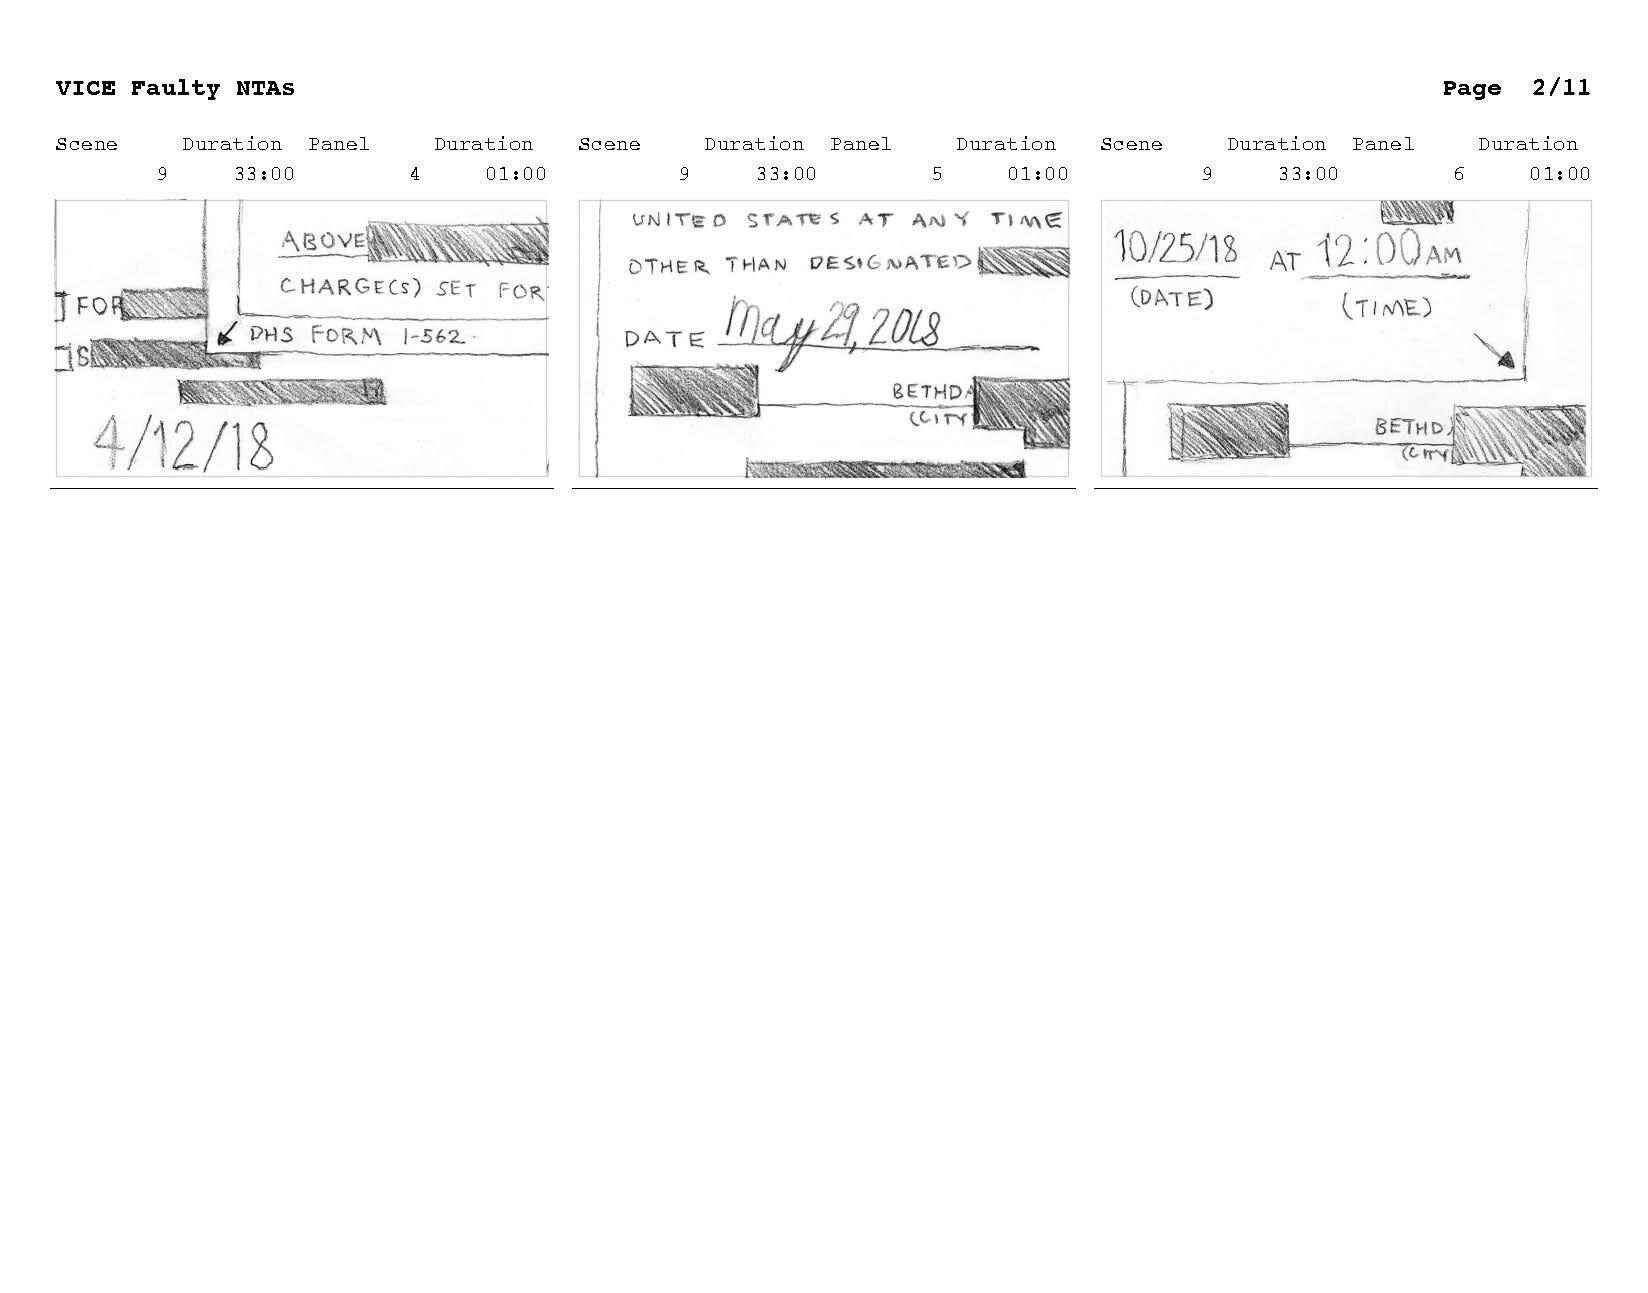 VICE News Tonight - Faulty NTAs storyboard_Page_02.jpg